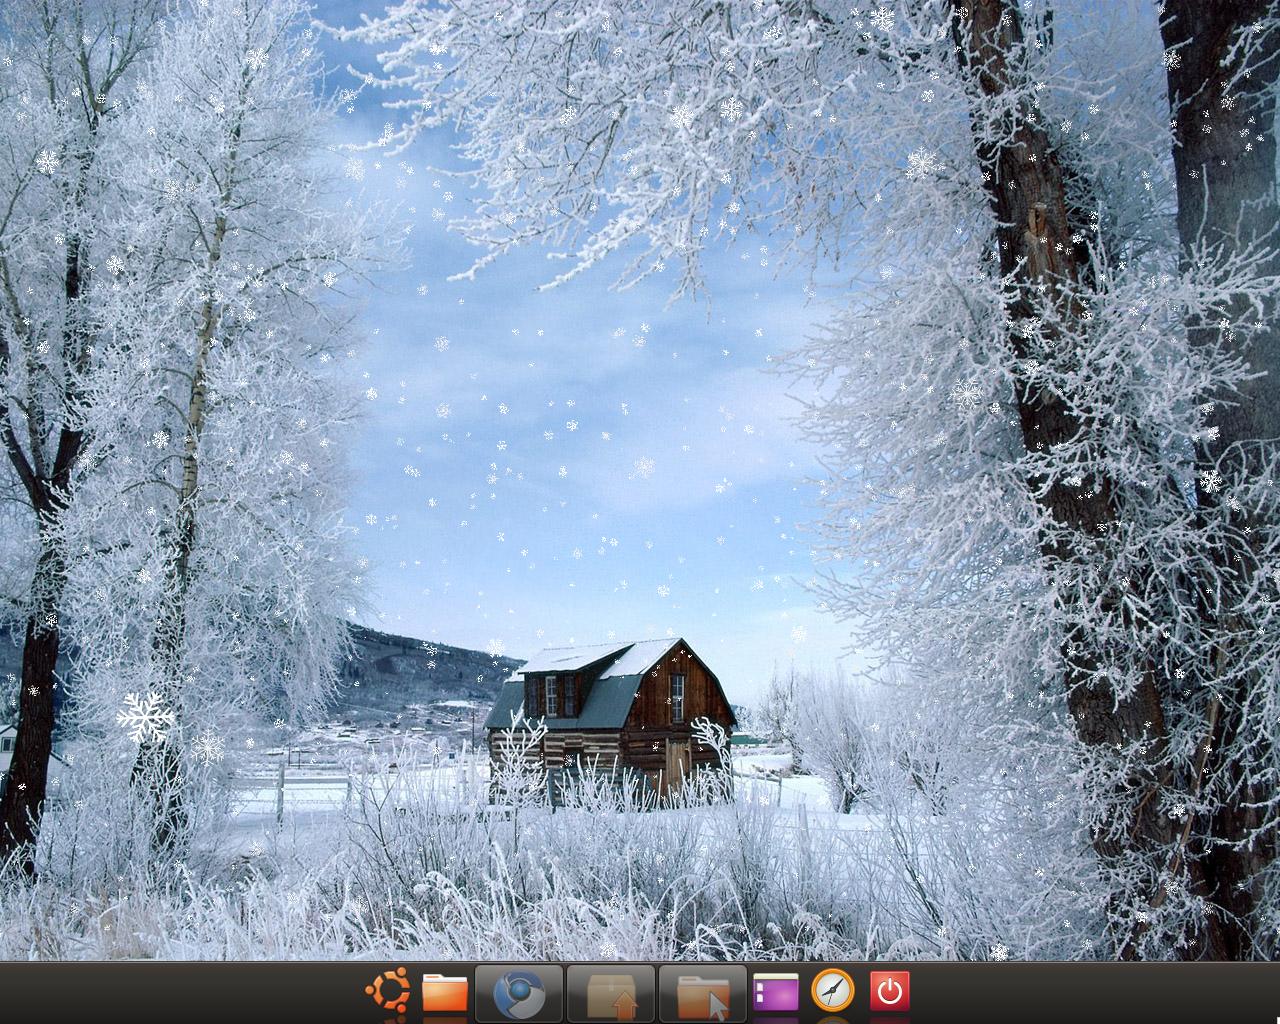 Customize Falling SnowLeavesObjects on Ubuntu Background Wallpaper 1280x1024